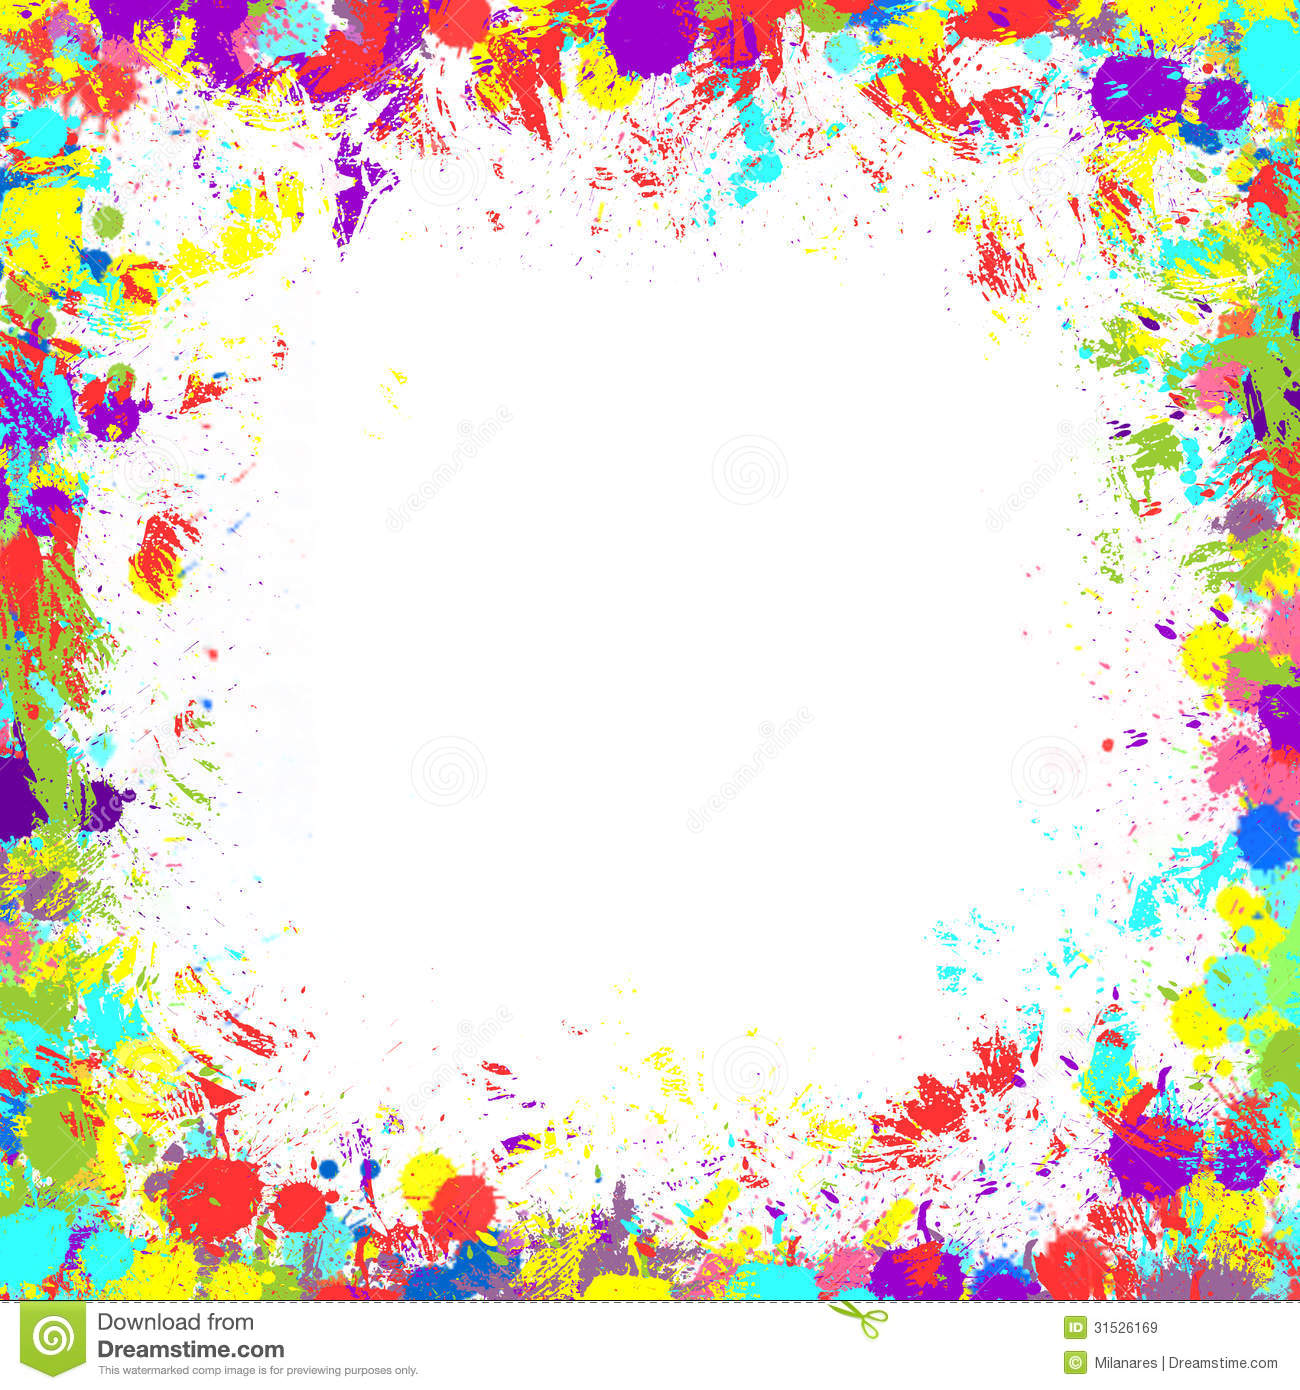 Colorful Inky Splash Frame Border Royalty Free Stock Images.